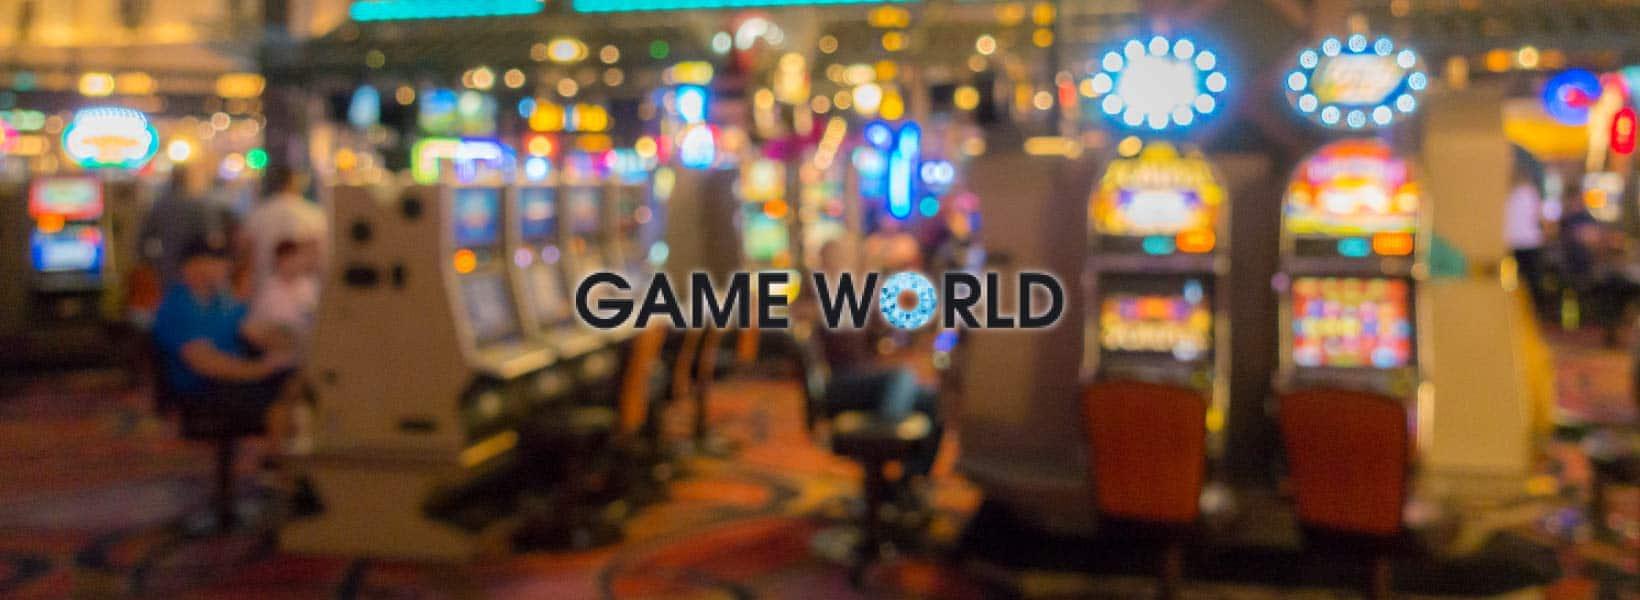 verificare cont game world